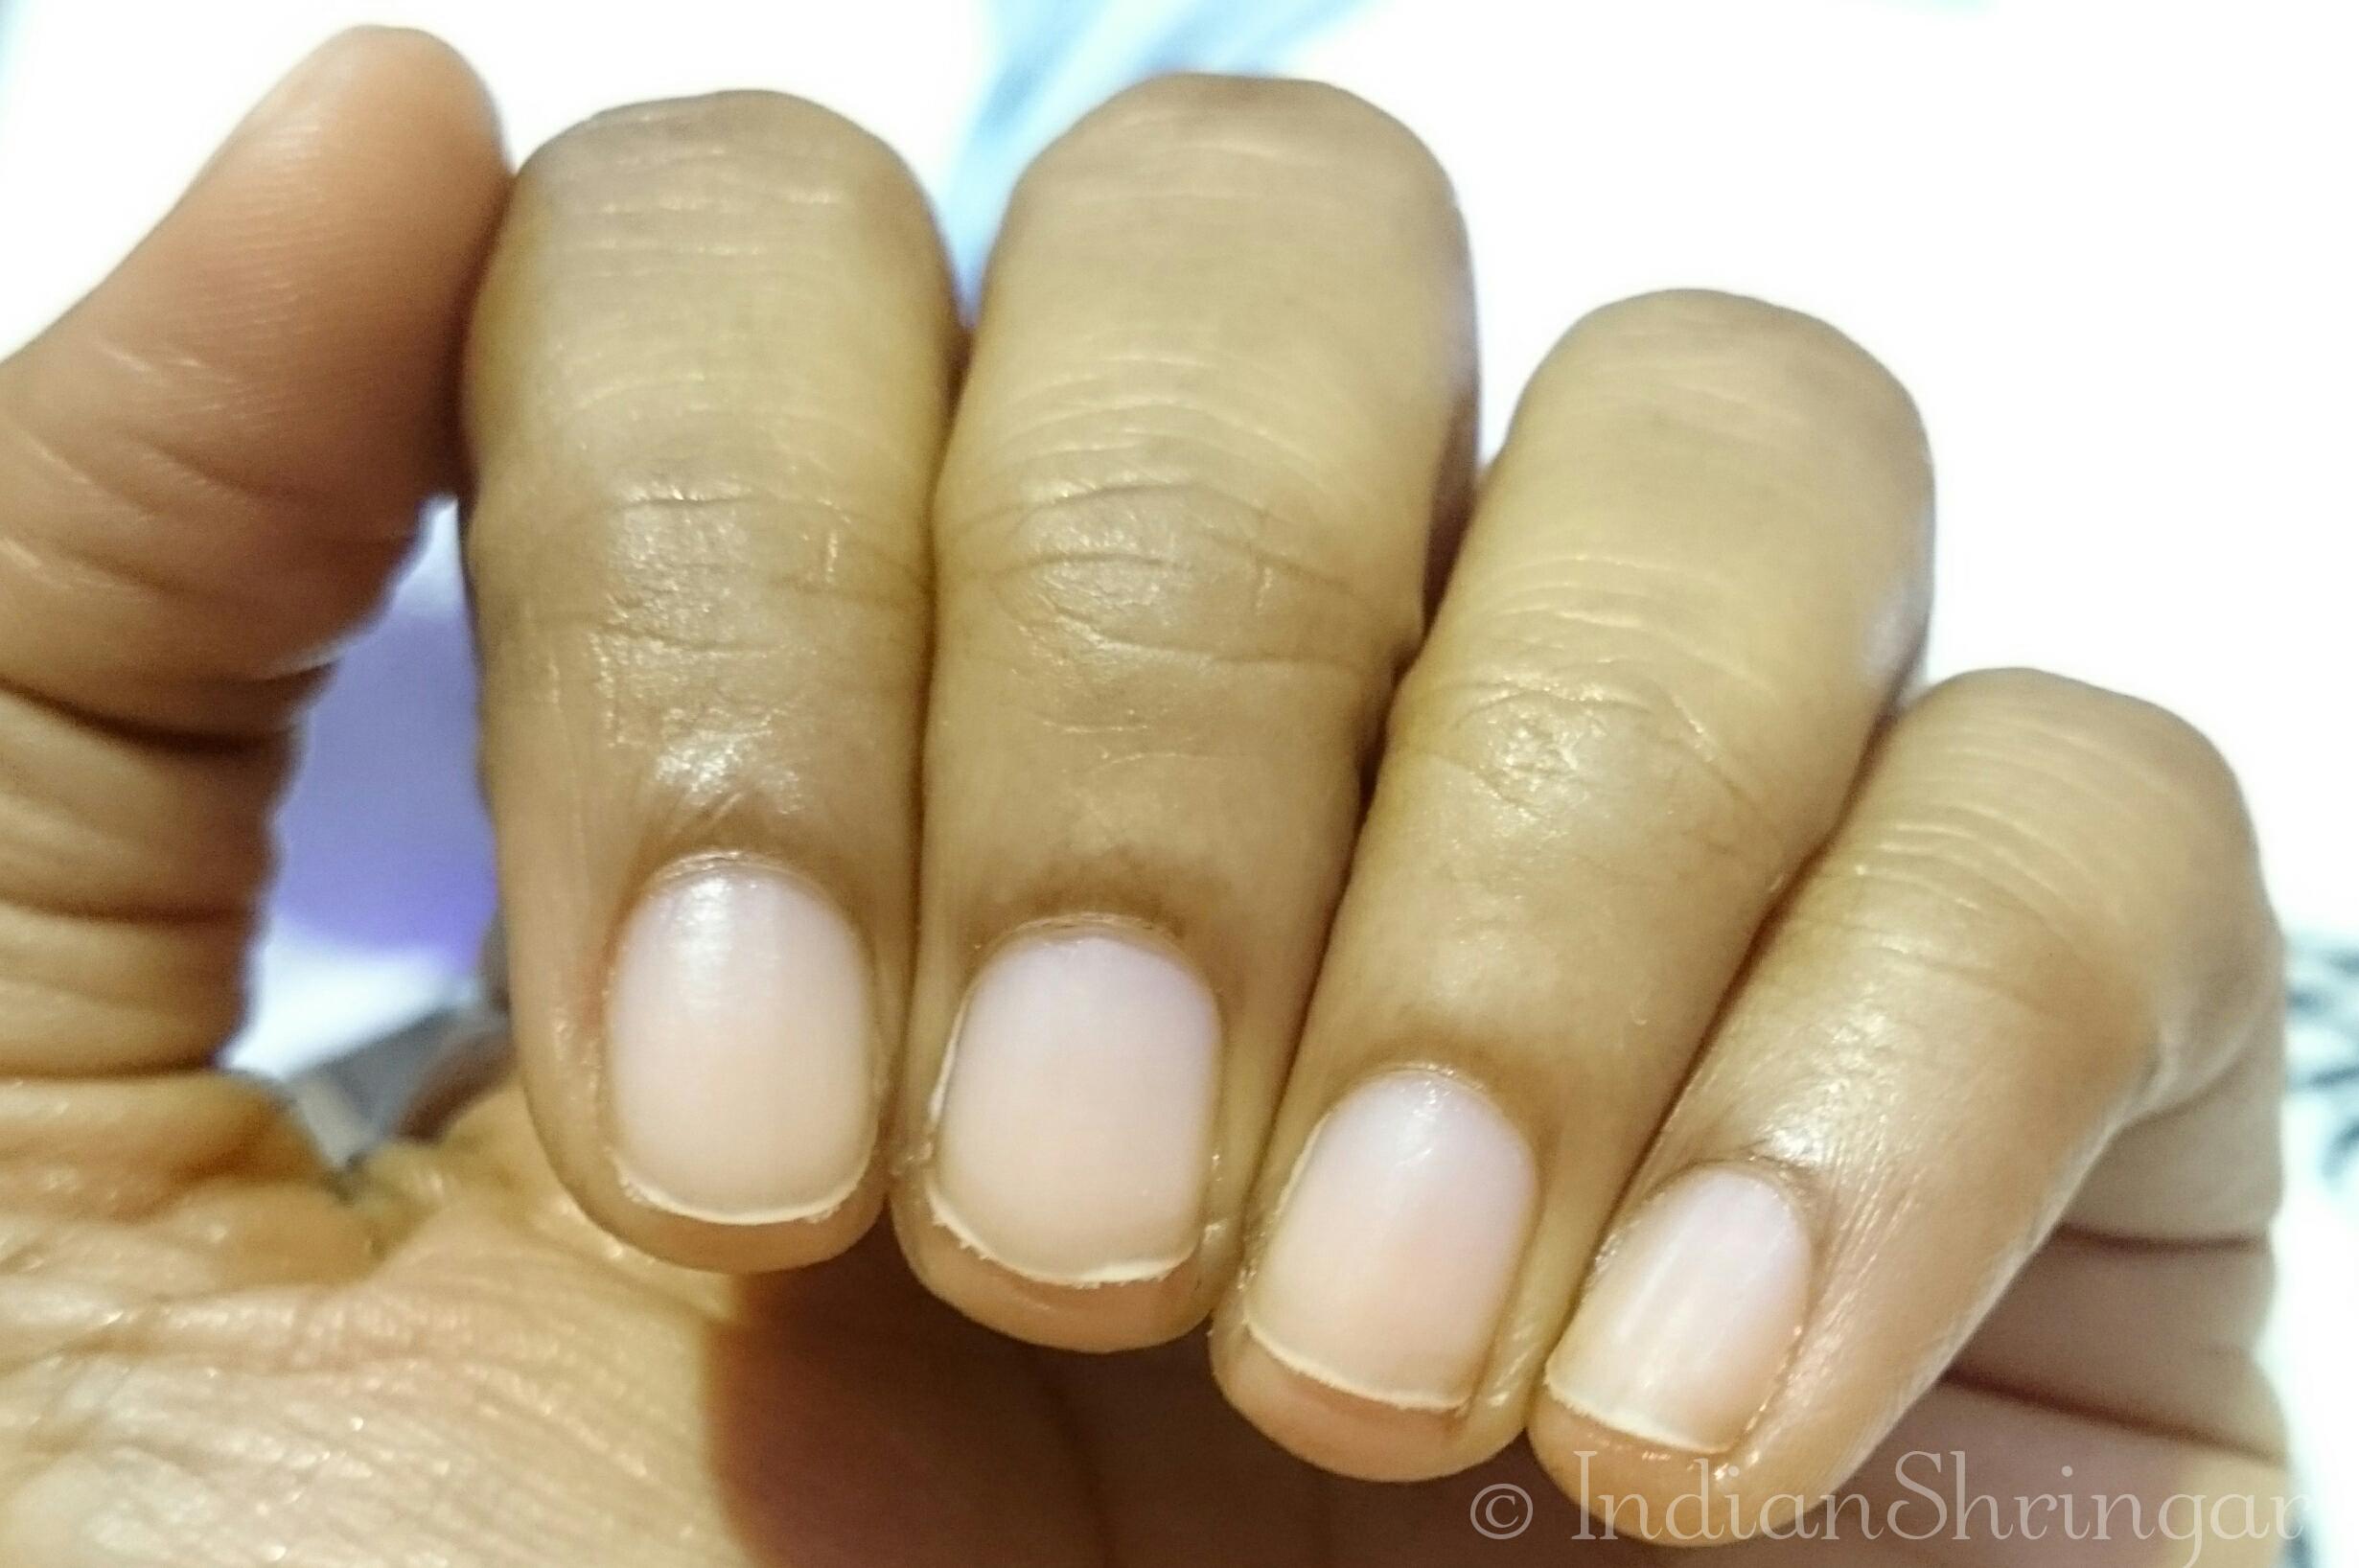 Gel nails extension manicure